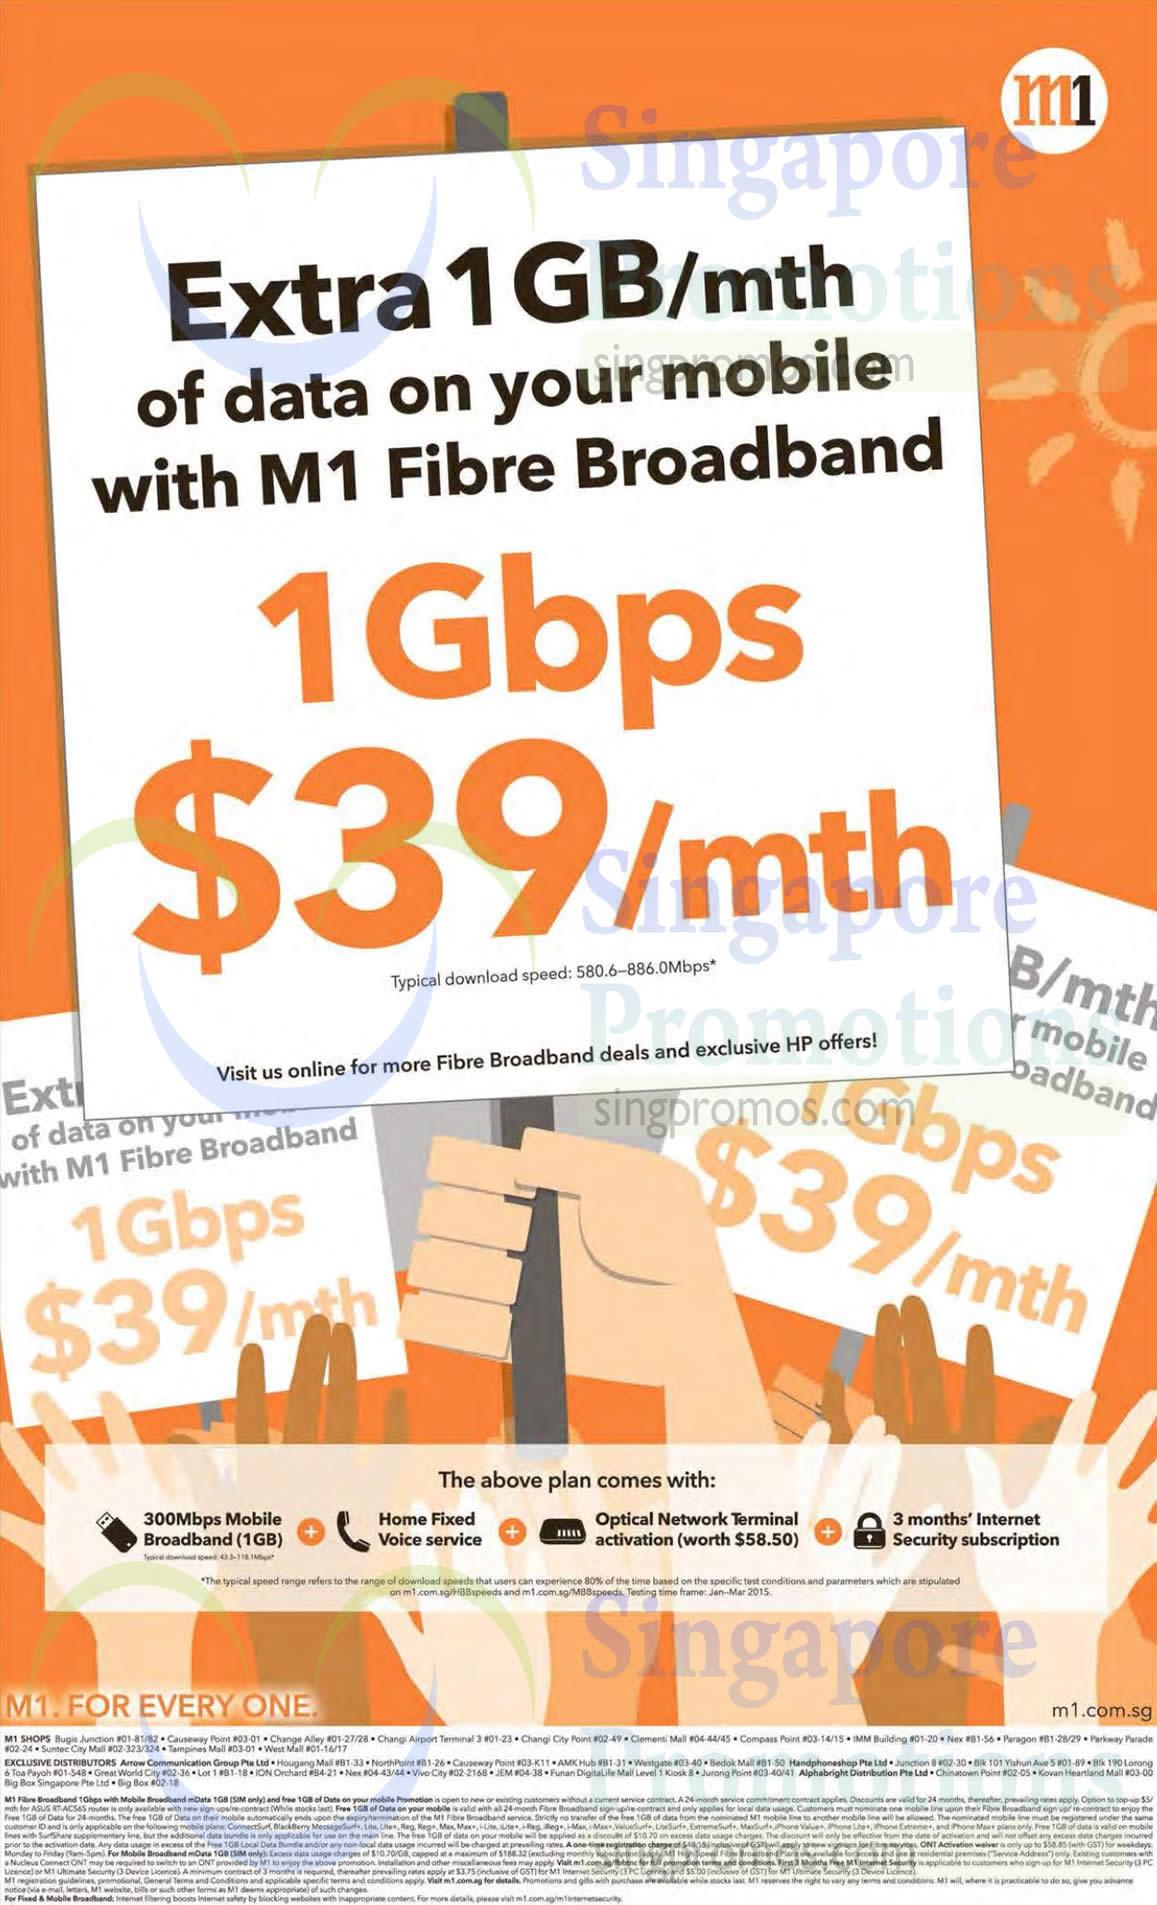 39.00 1Gbps Fibre Broadband